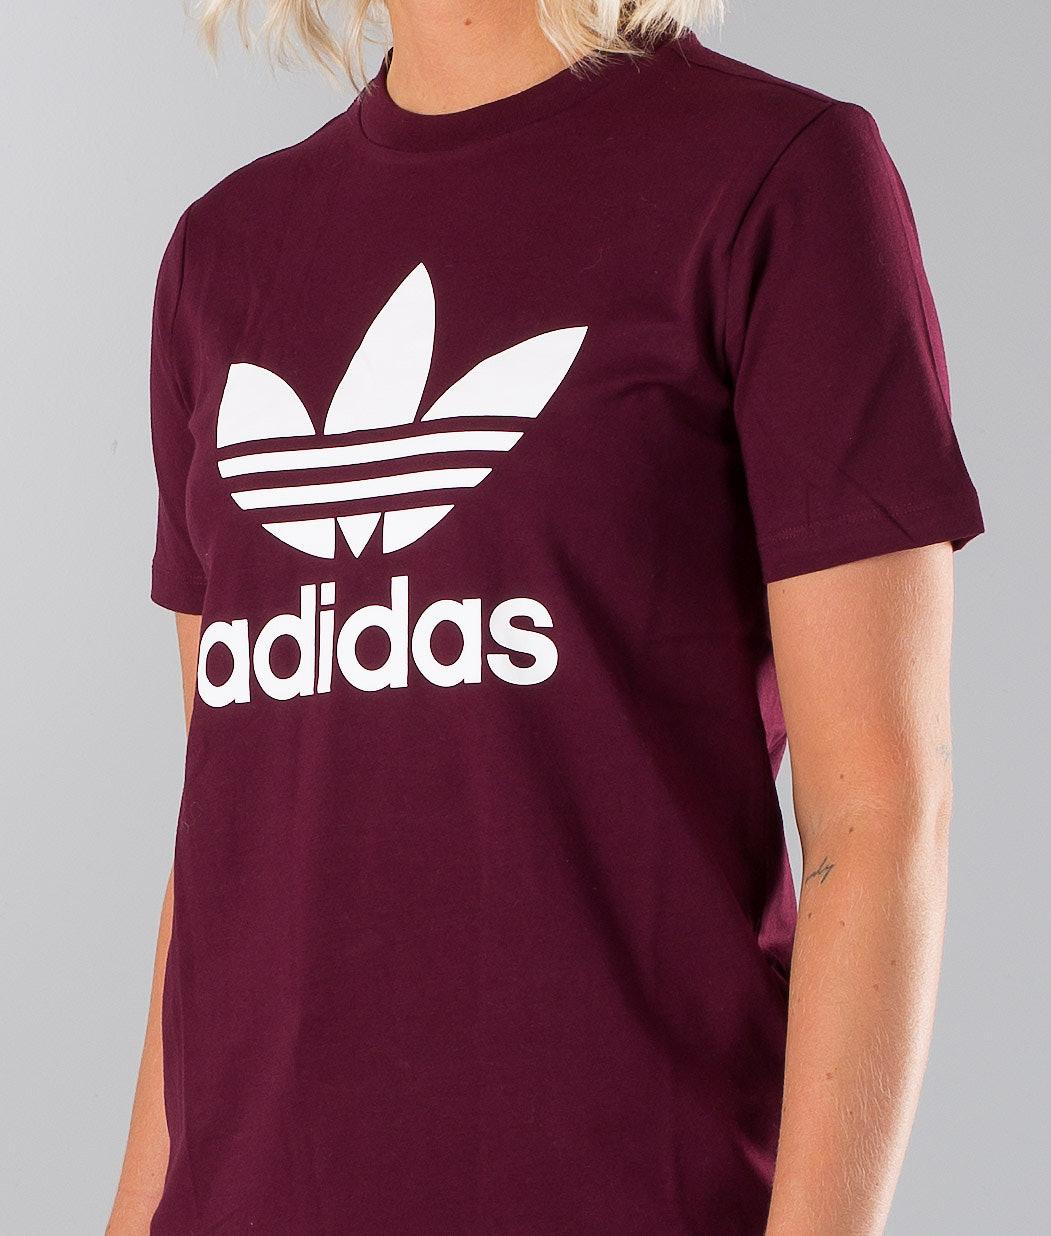 248f3fefc Adidas Originals Trefoil T-shirt Maroon - Ridestore.com